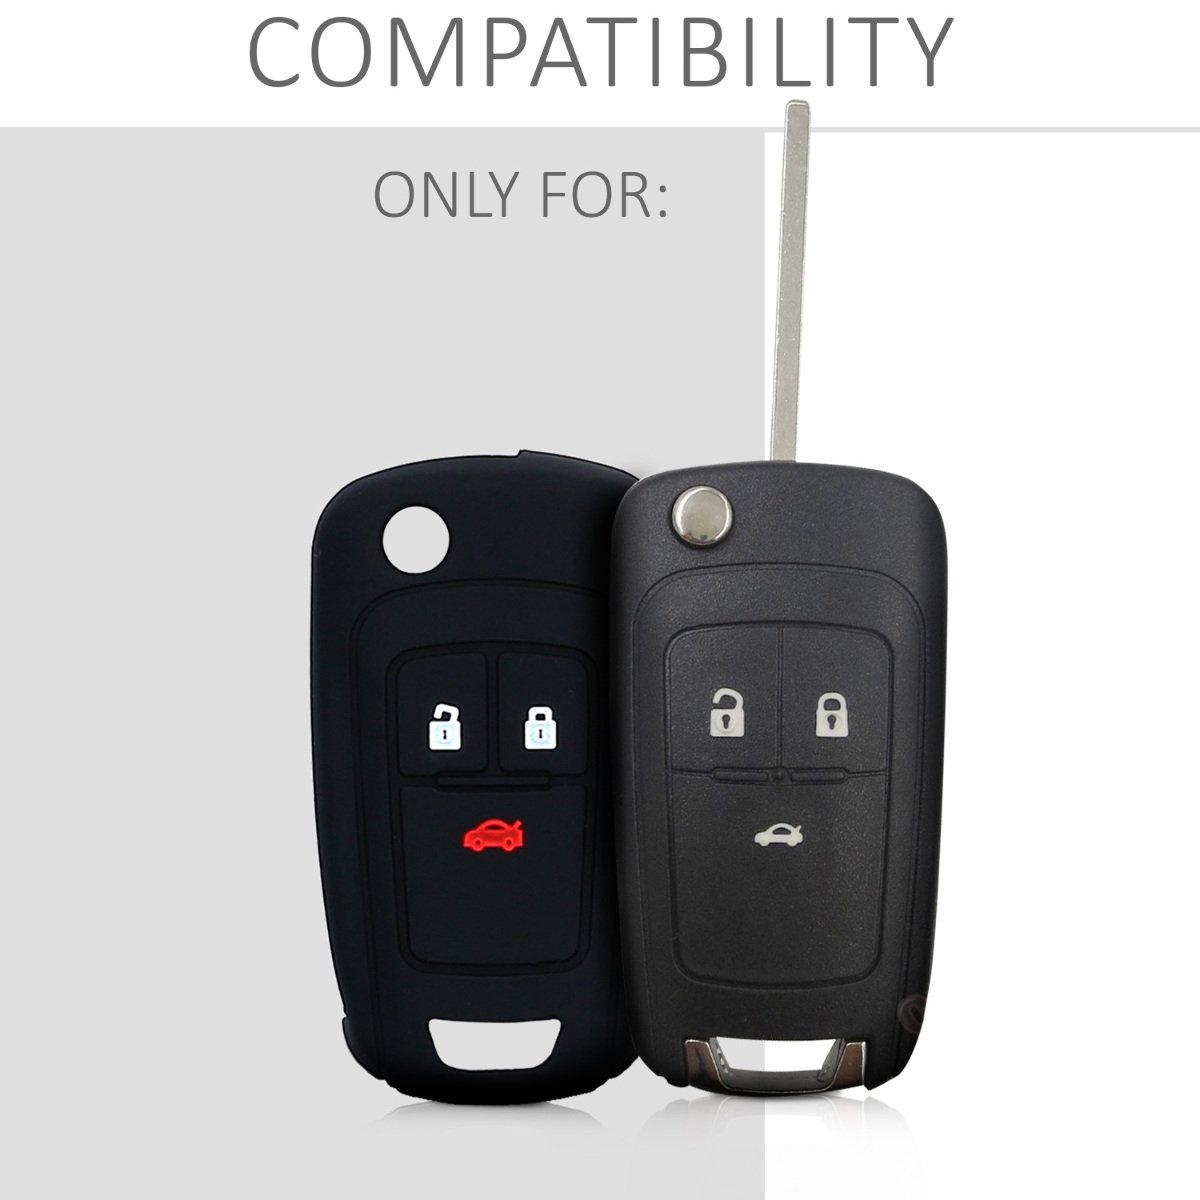 kwmobile Funda de Silicona para Llave Plegable de 3 Botones para Coche Opel Vauxhall - Carcasa Protectora [Suave] de [Silicona] - Case Mando de Auto ...